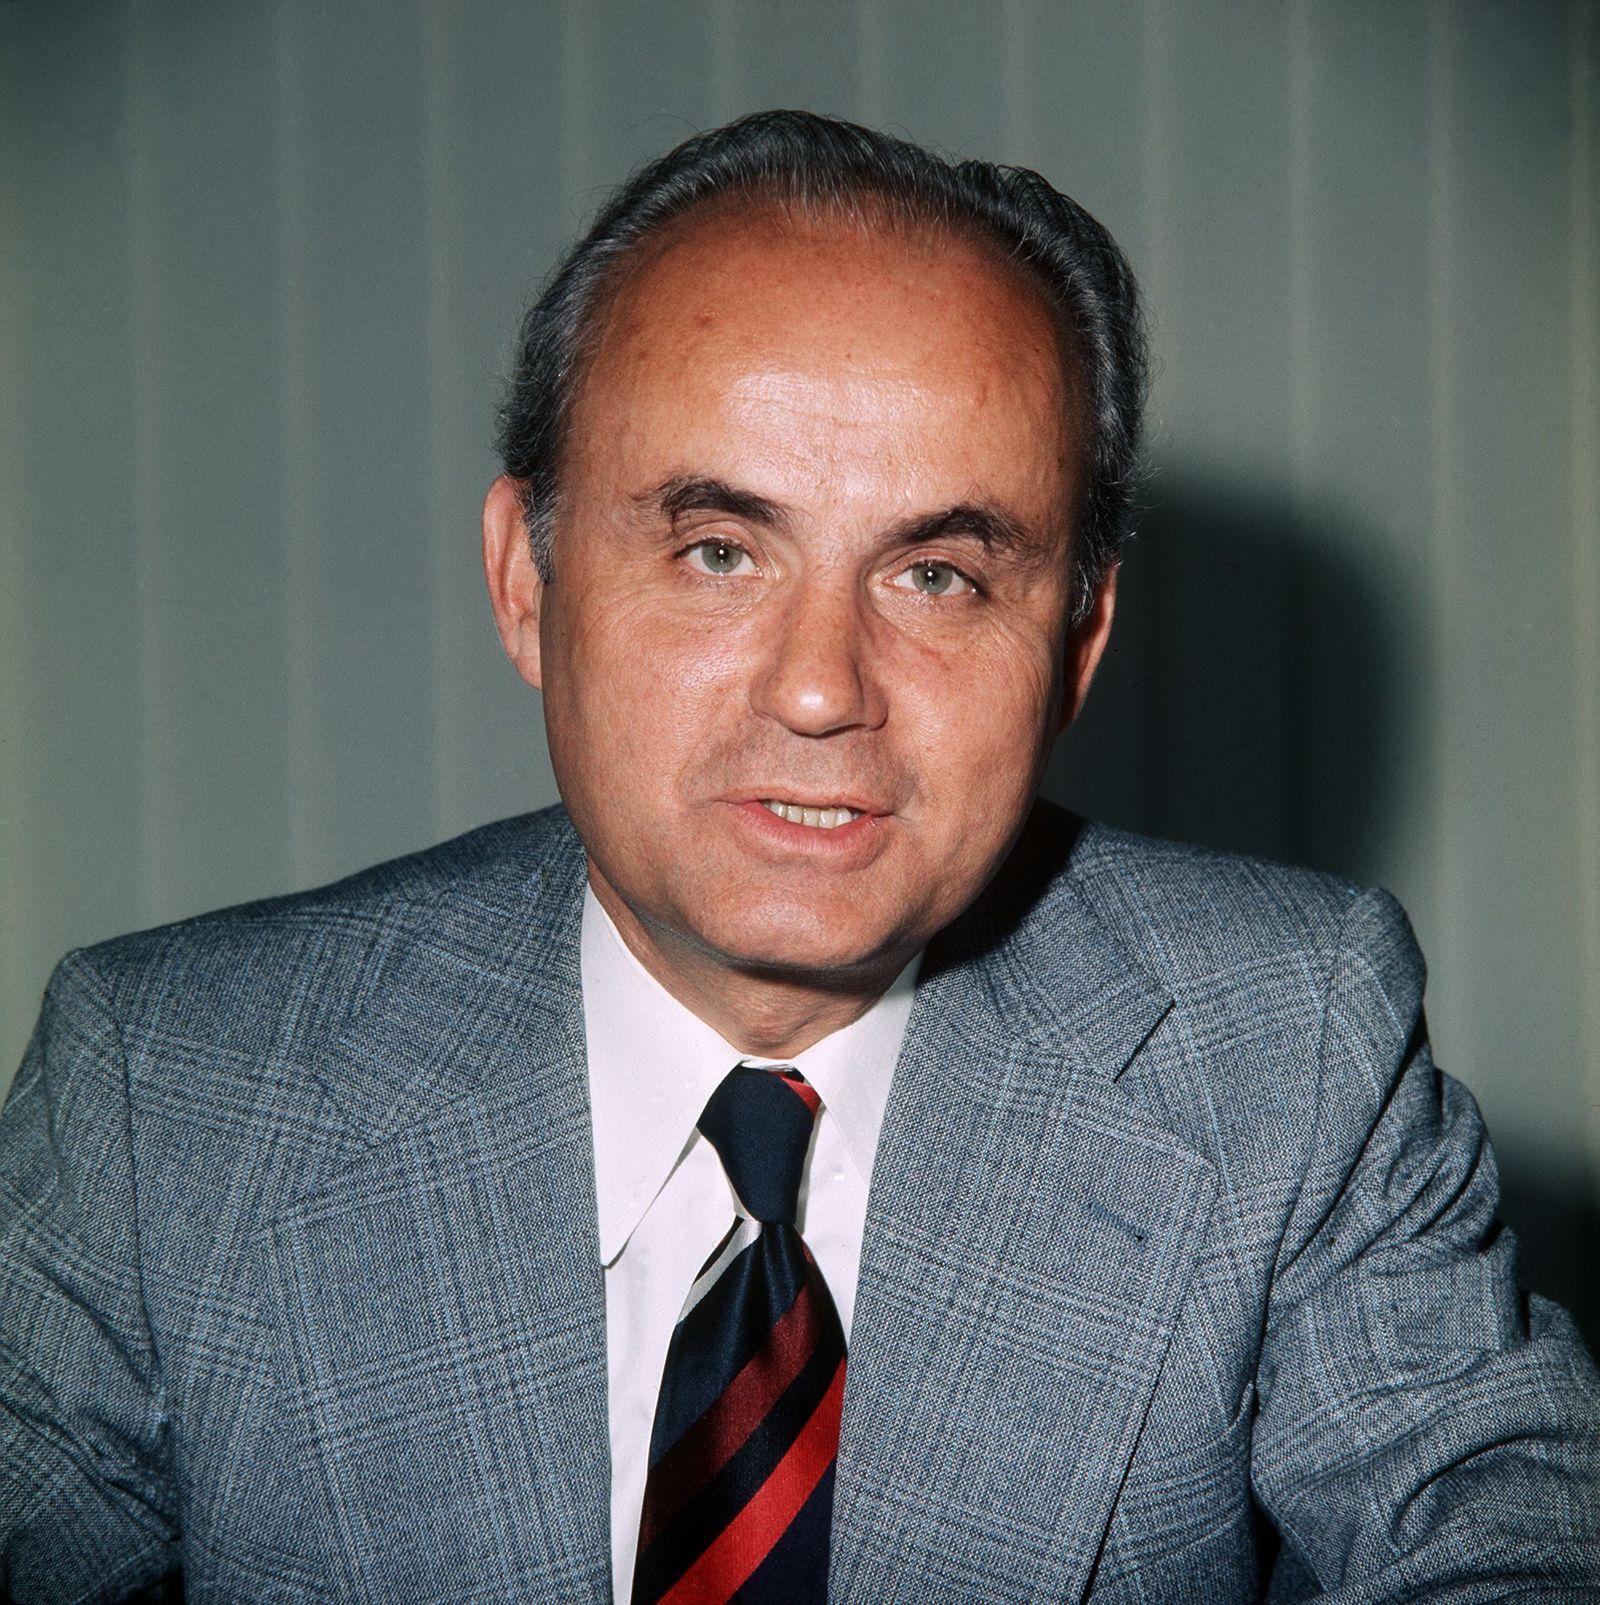 Finanzminister / Hans Matthöfer